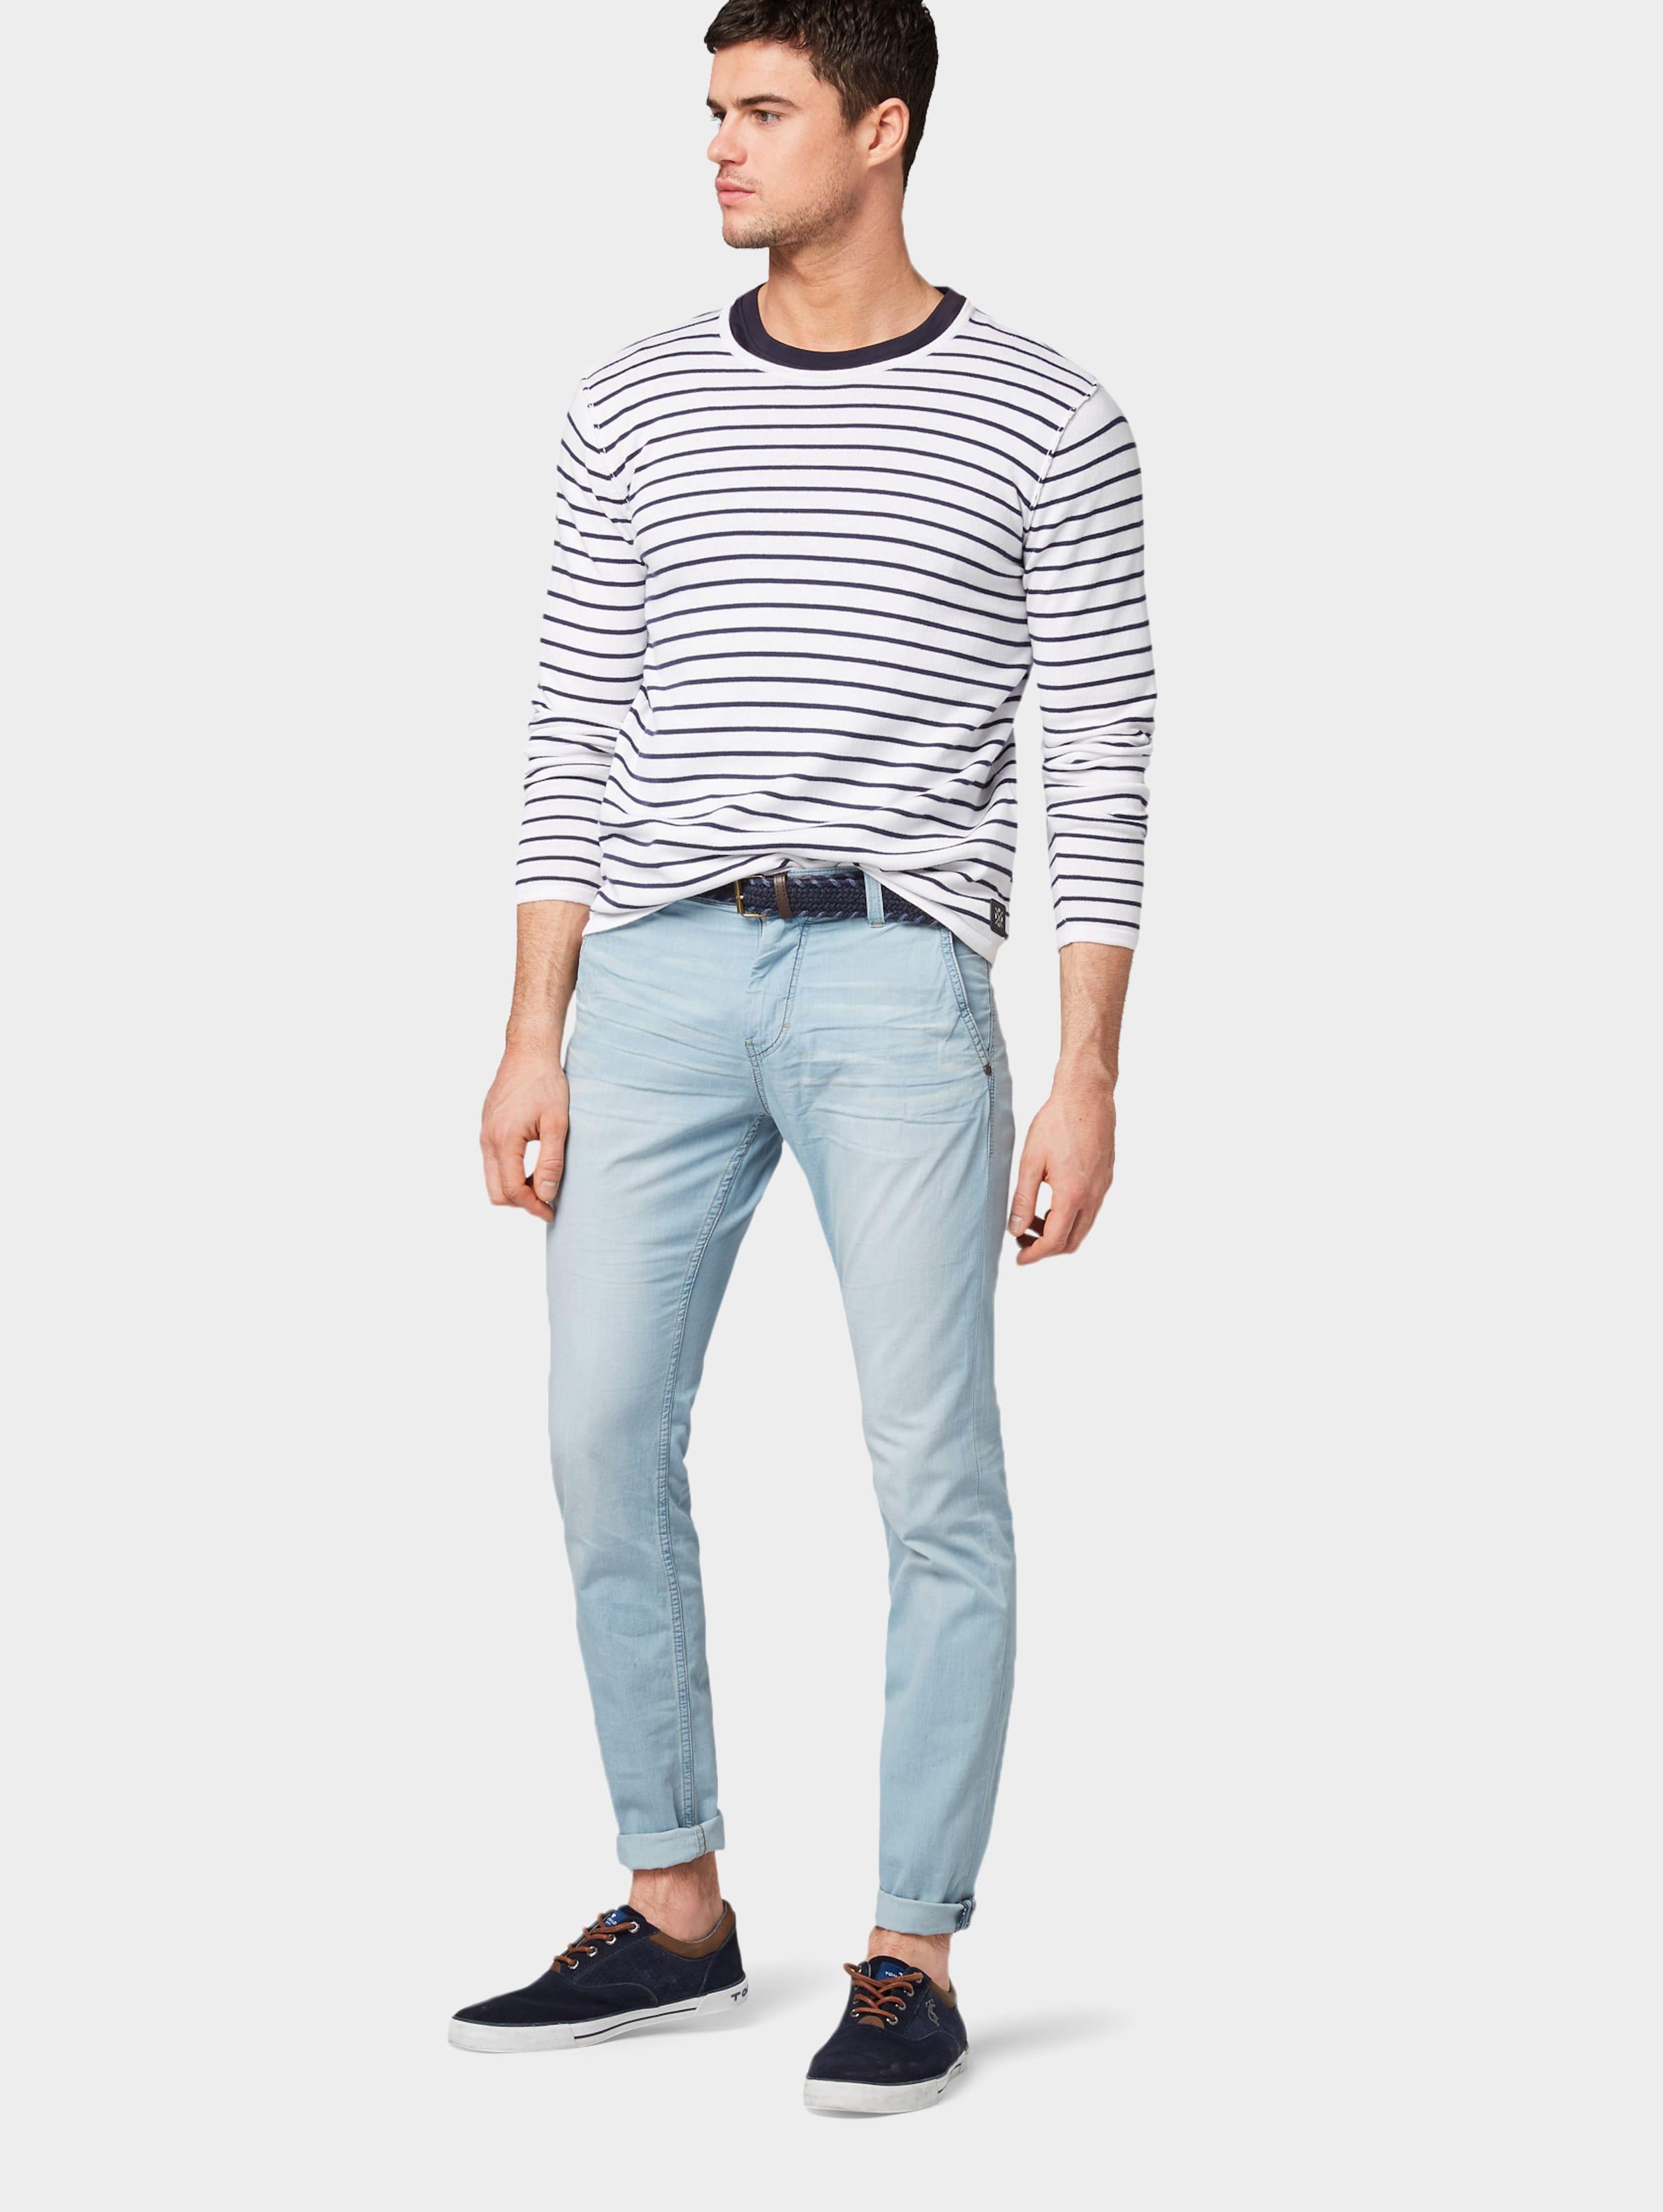 Jeans Rauchblau 'josh' Tailor In Tom YWD9e2bEHI